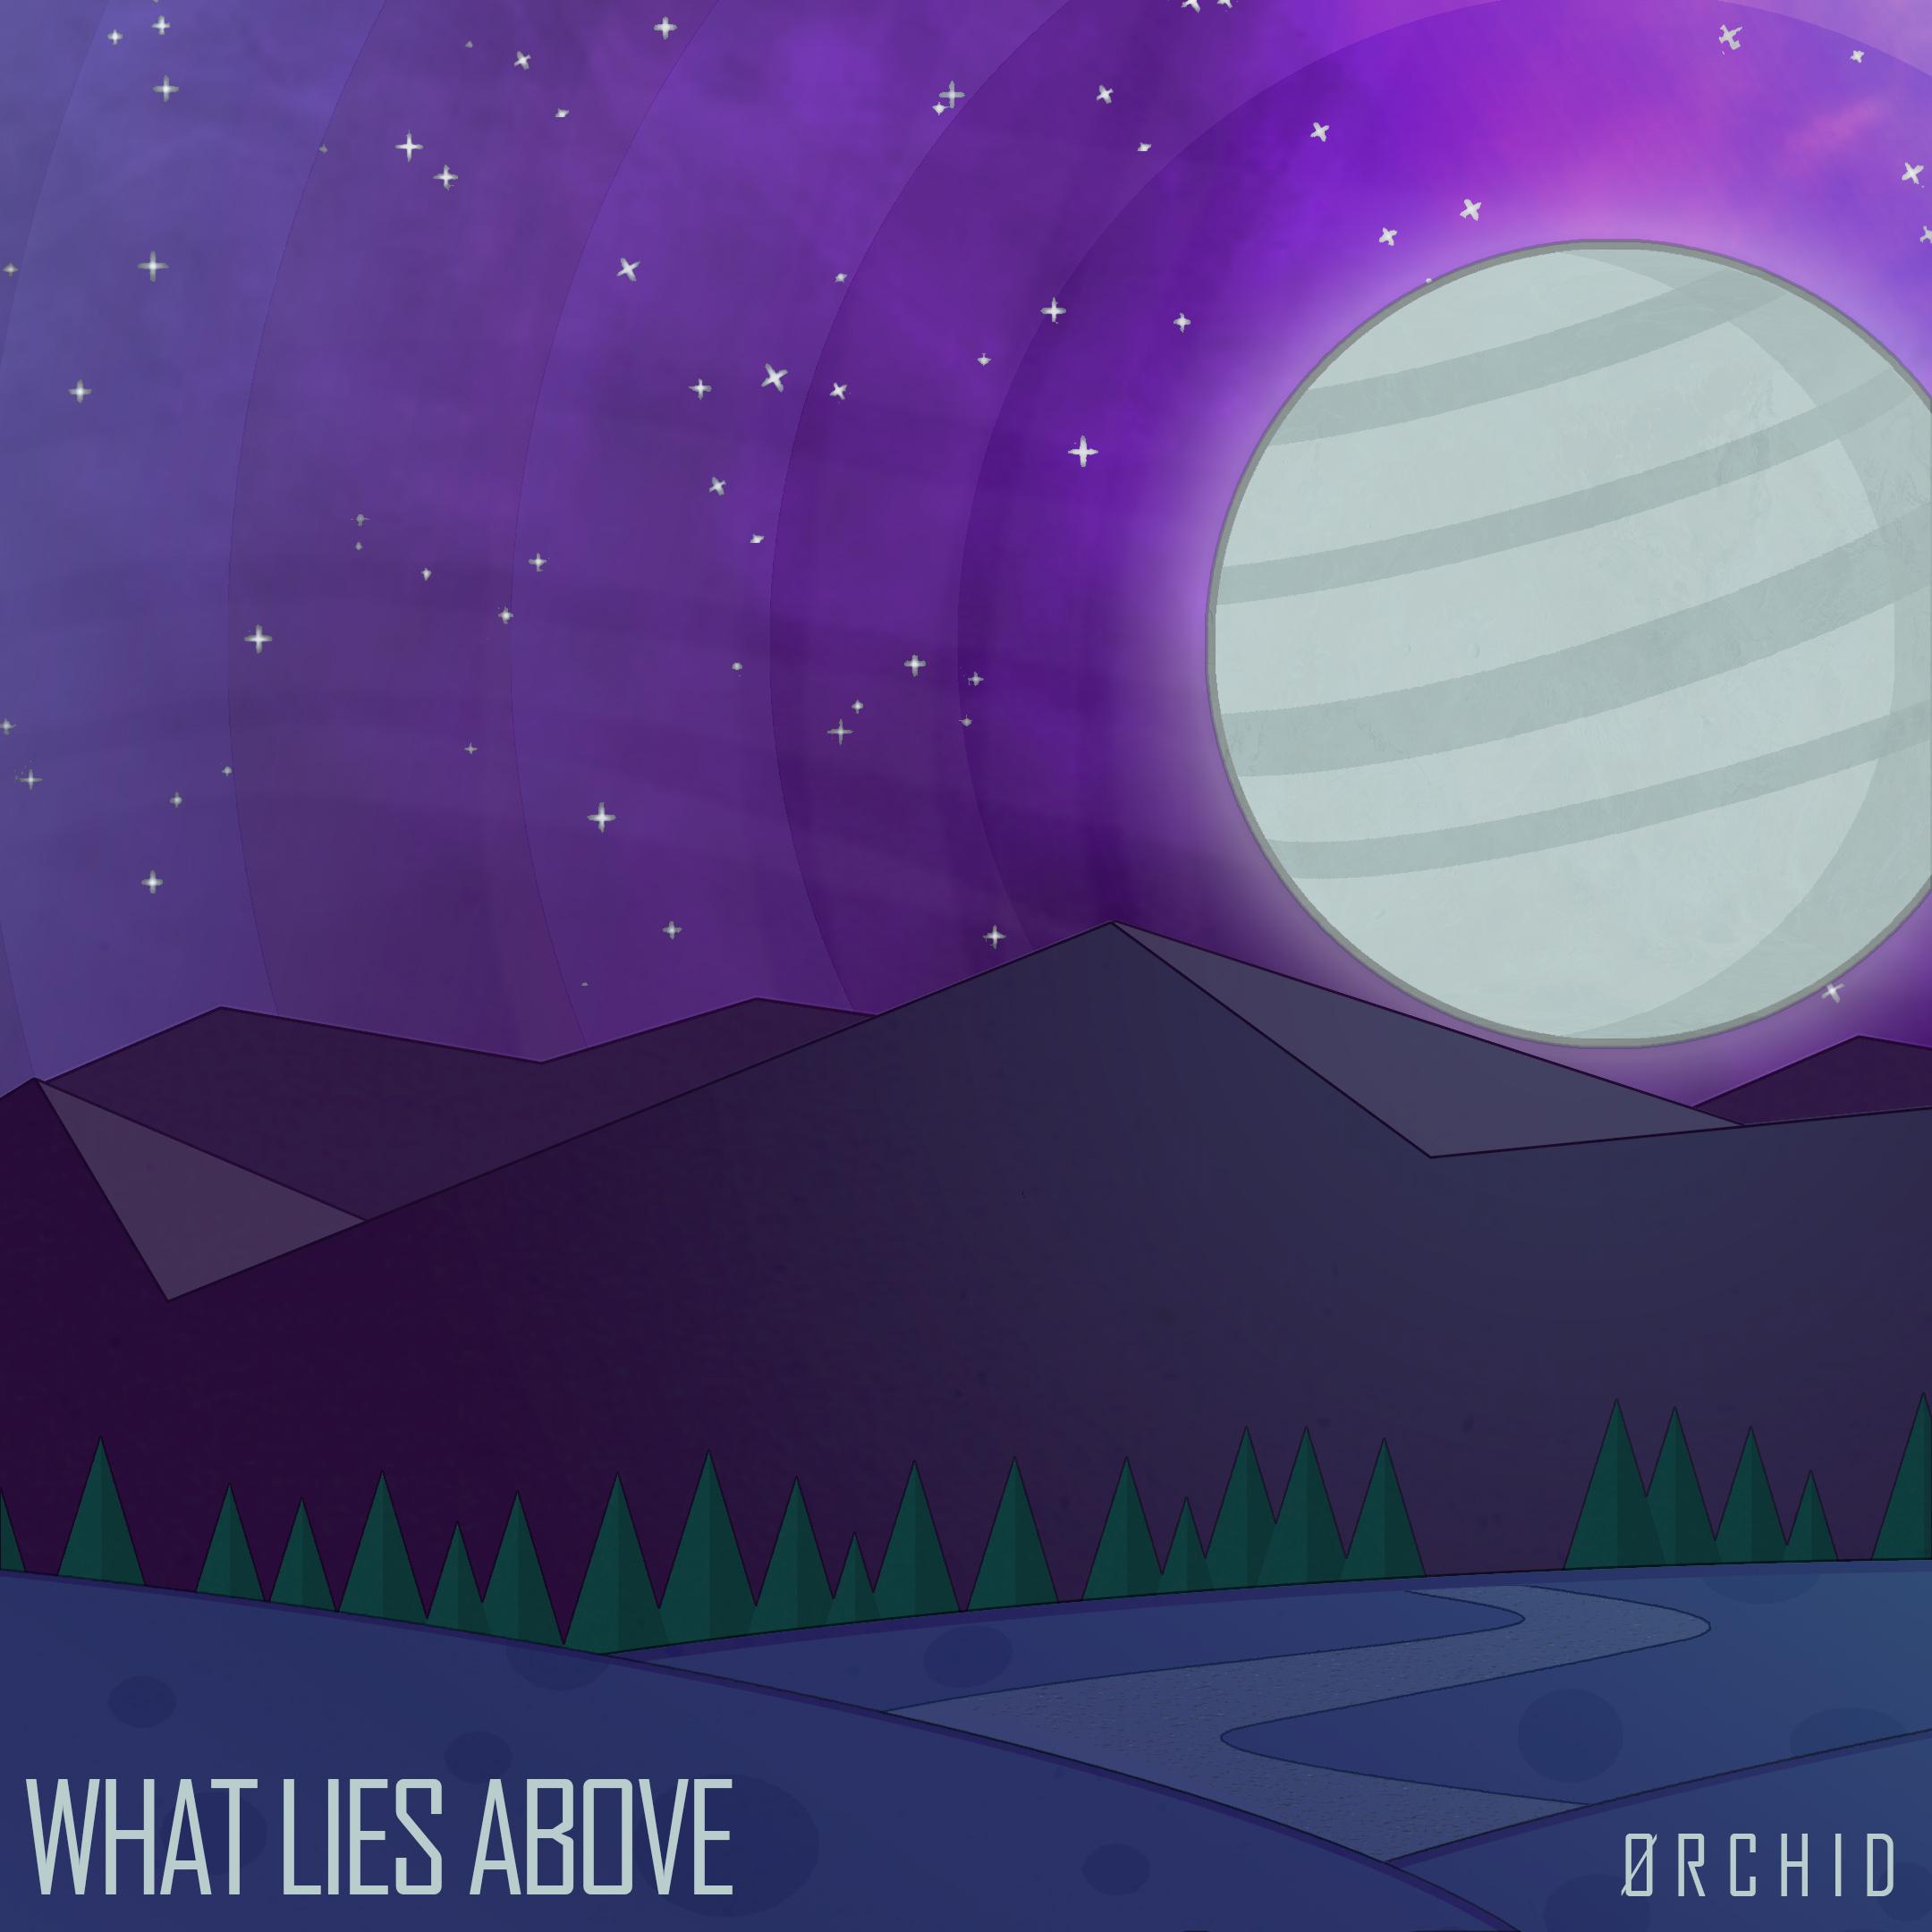 What Lies Above (ØRCHID)